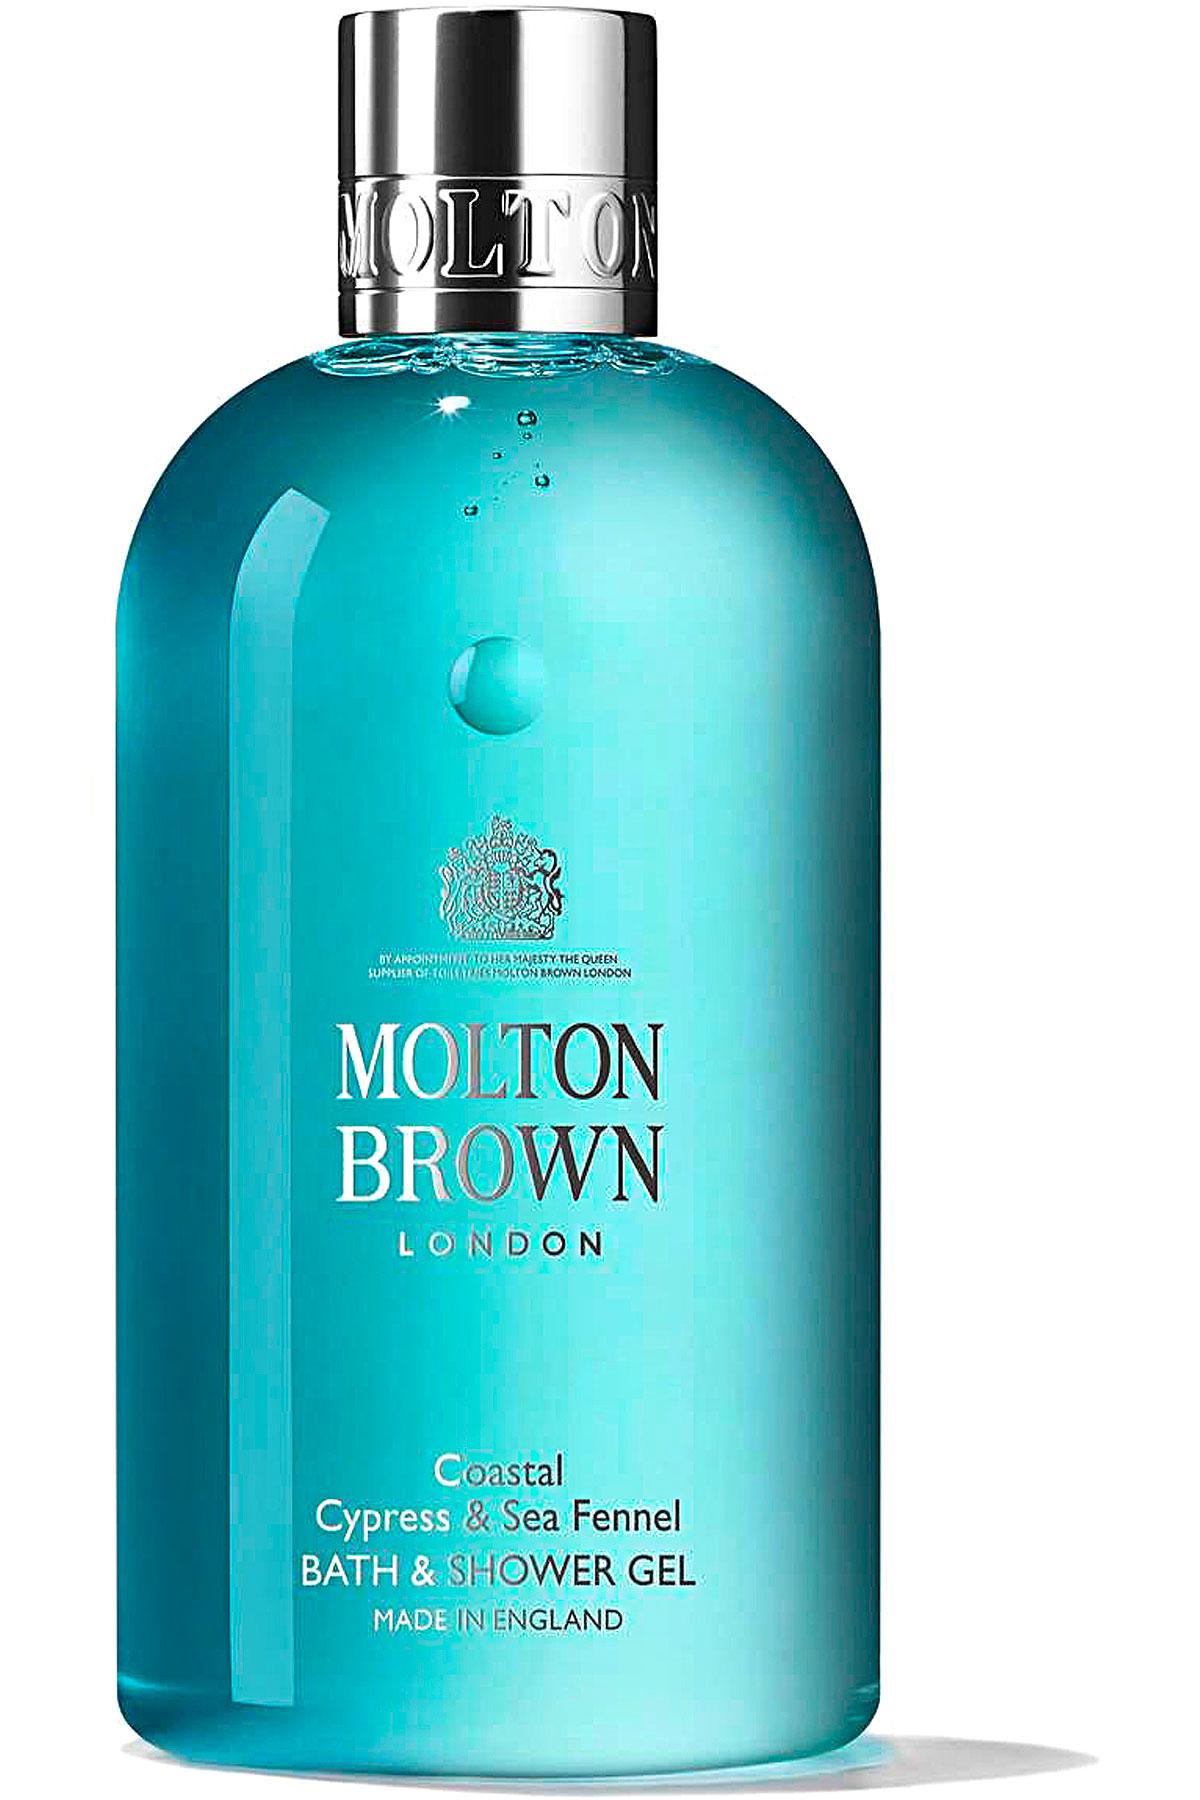 Molton Brown Beauty for Women, Coastal Cypress & Sea Fennel - Bath & Shower Gel - 300 Ml, 2019, 300 ml